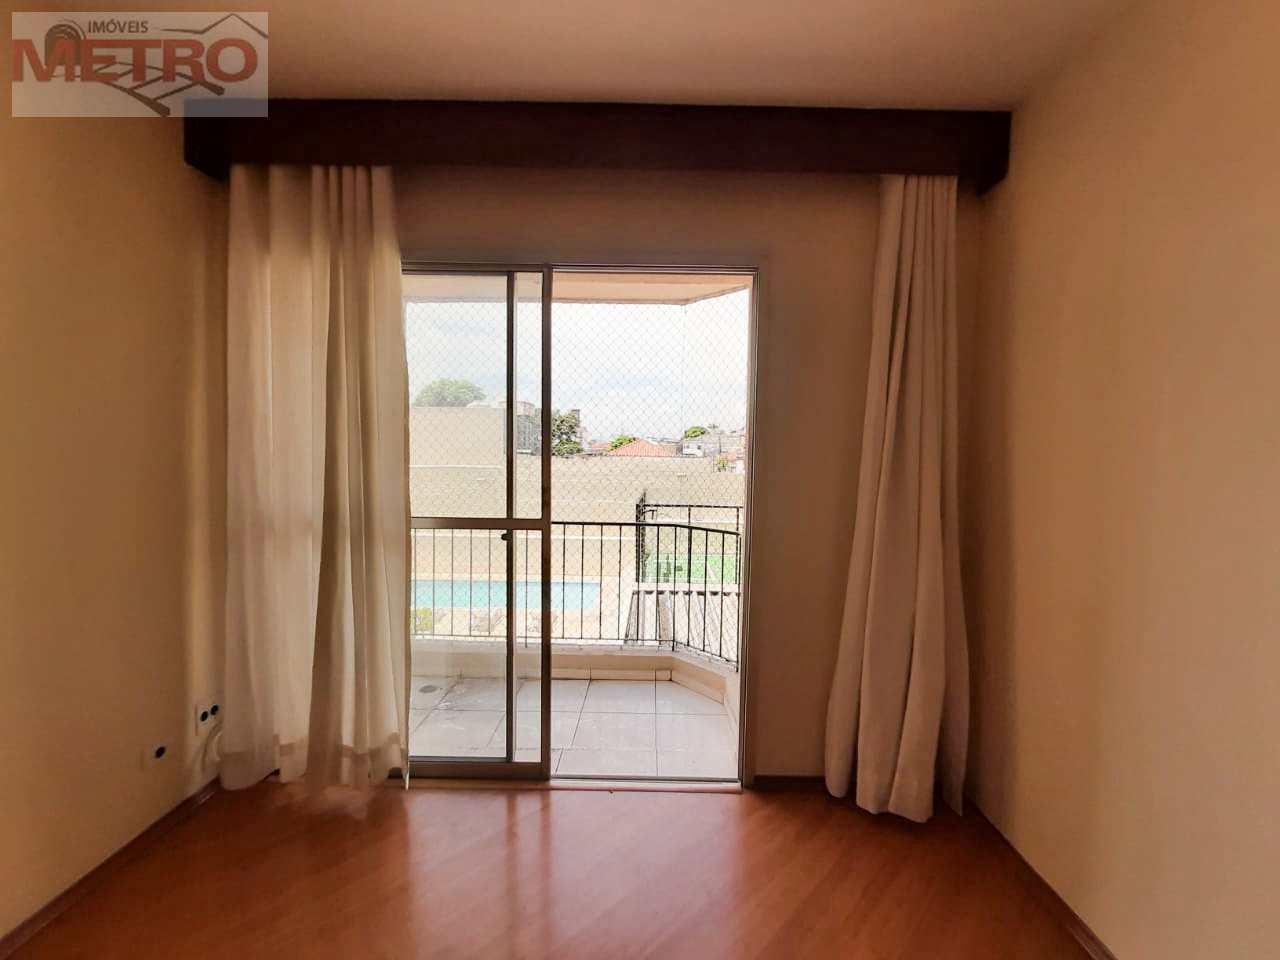 Apartamento com 2 dorms, Vila Santa Catarina, São Paulo - R$ 298 mil, Cod: 91138